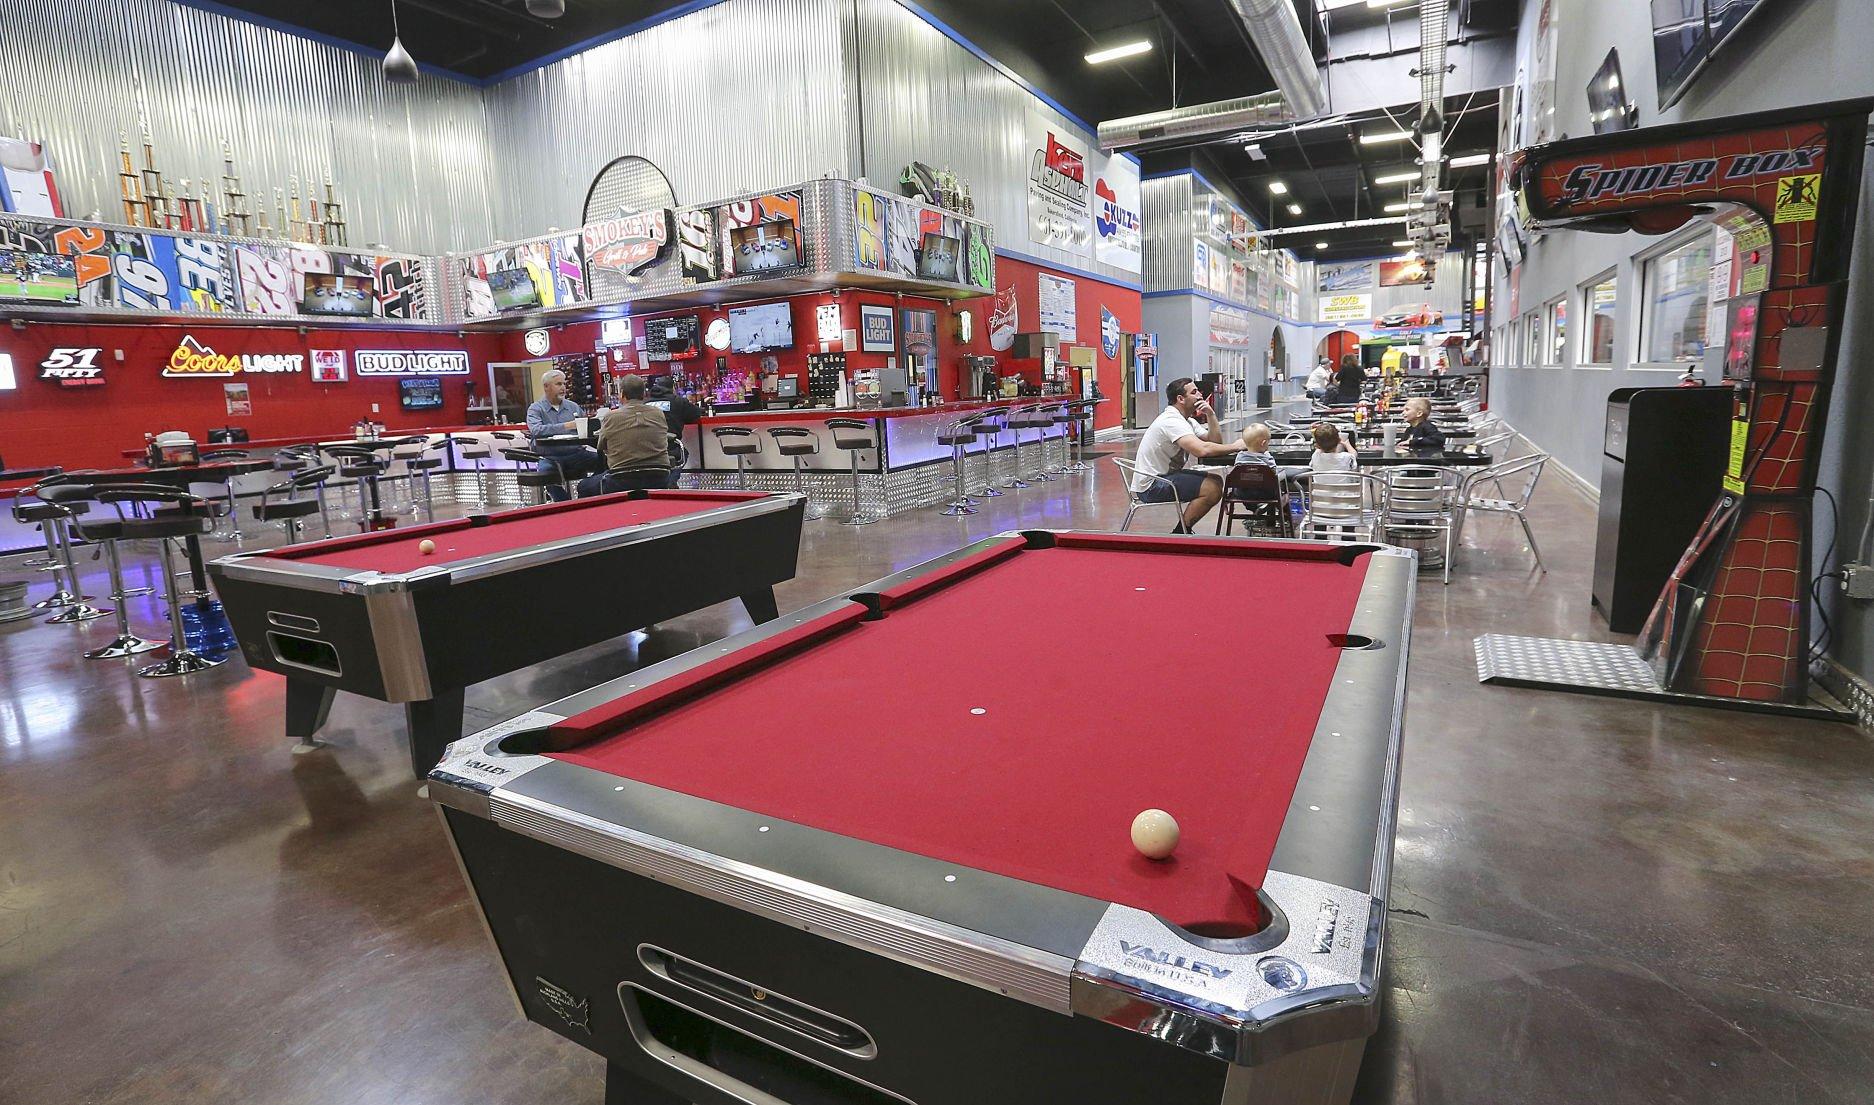 20170306 Bc Kart 12. Pool Tables ...